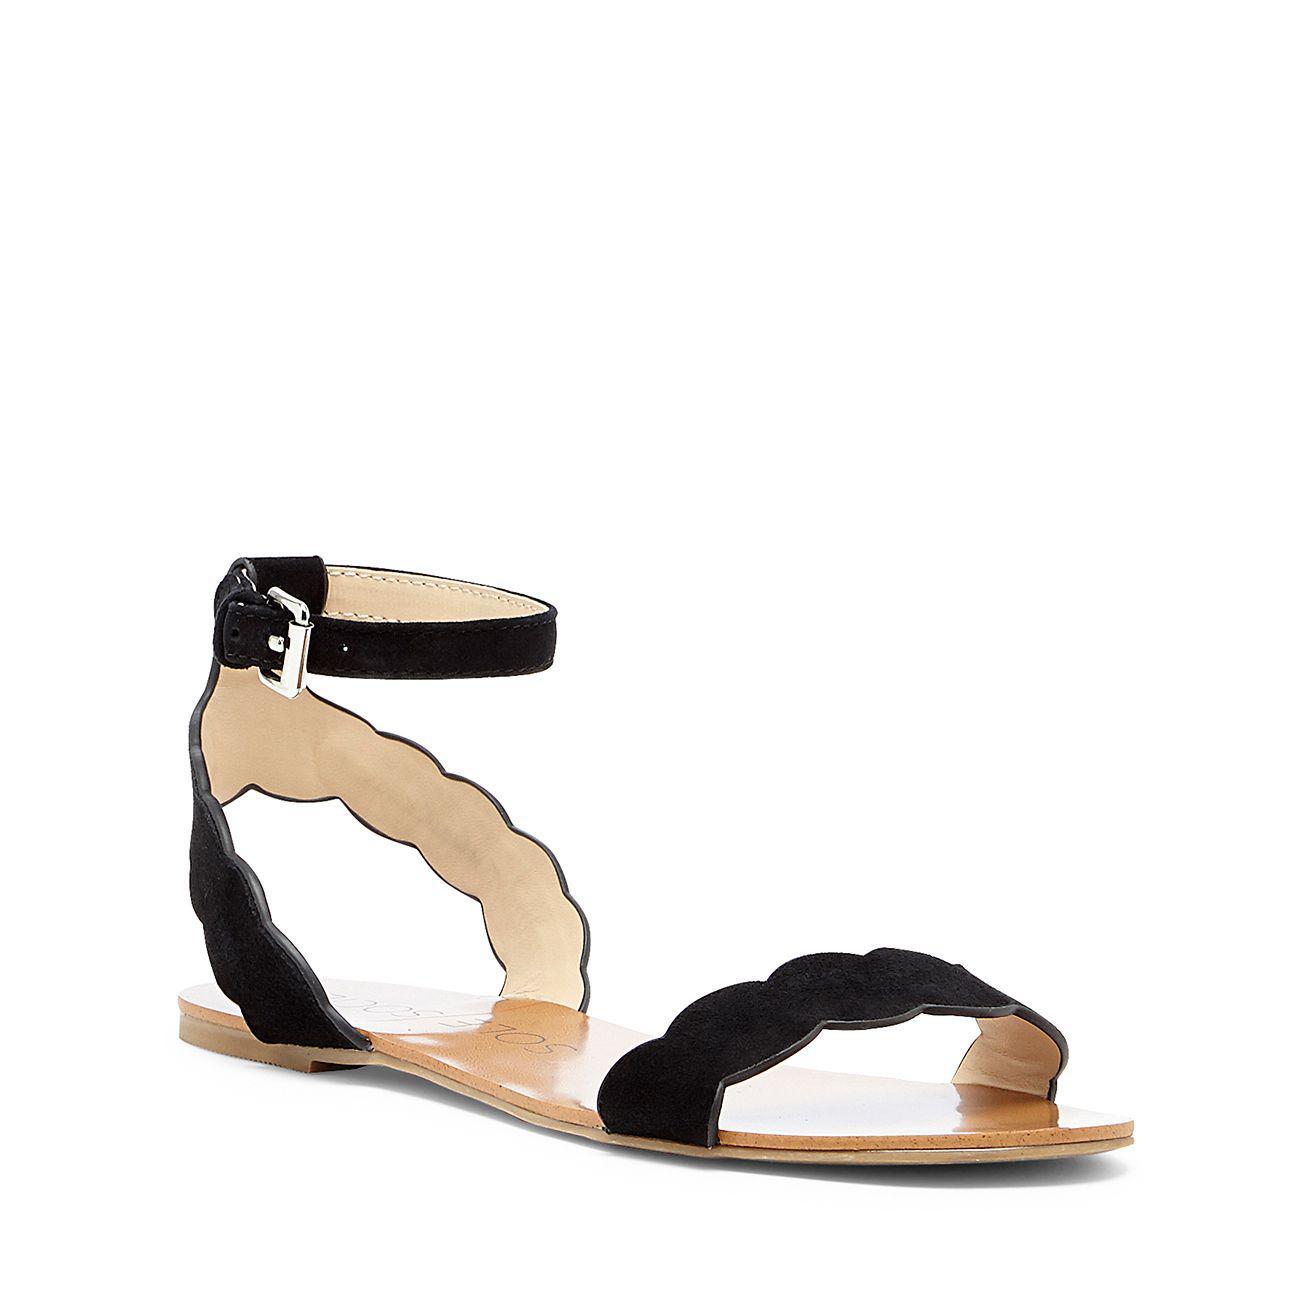 fe56445459a Lyst - Sole Society Odette Scalloped Flat Sandal in Black